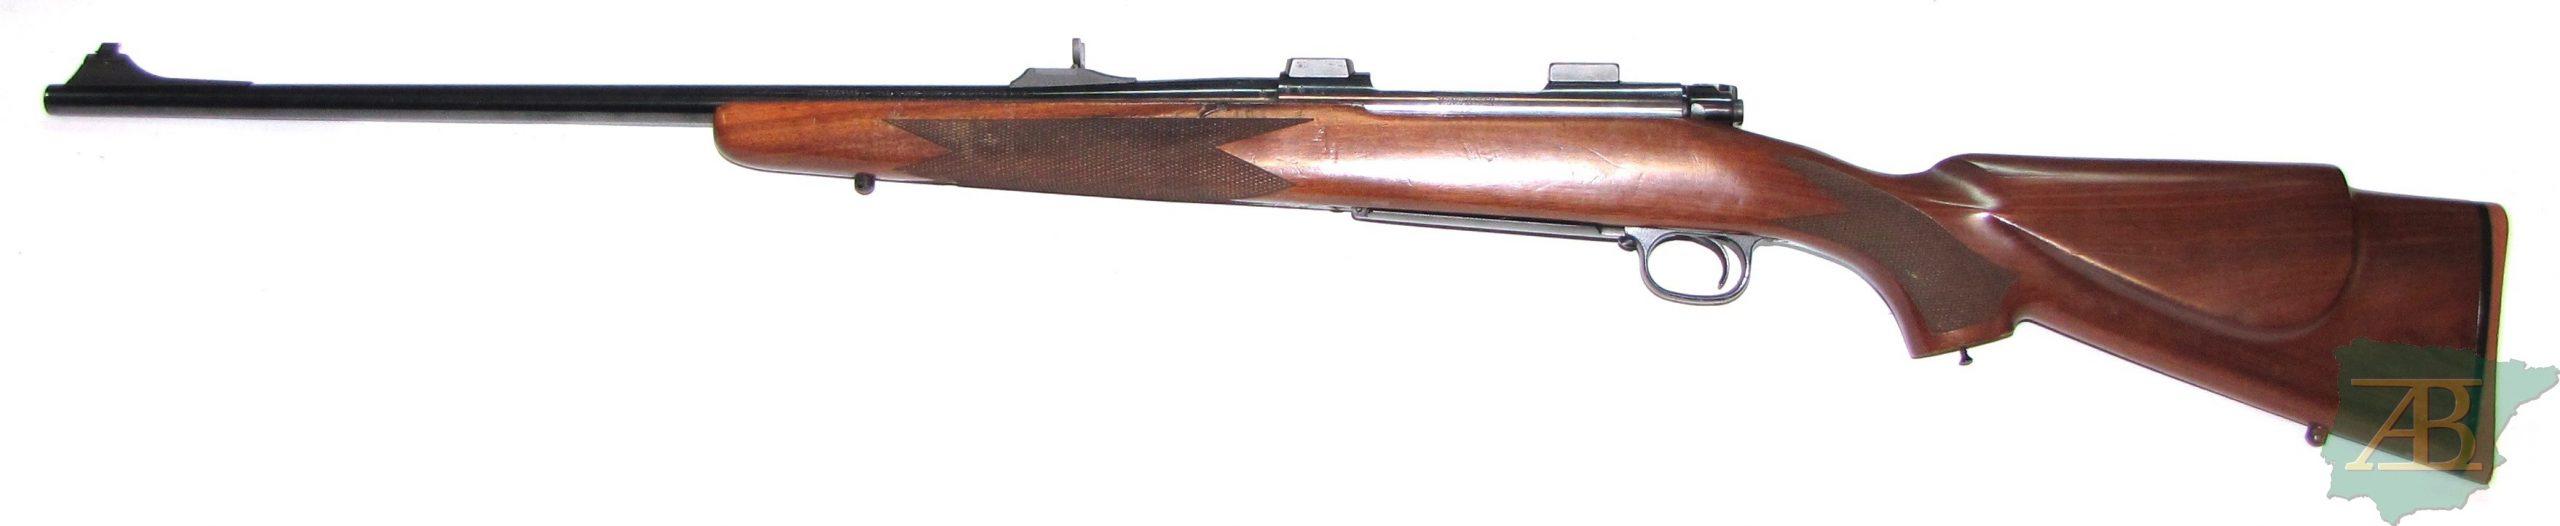 Rifle de cerrojo de caza WINCHESTER 70 XTR SPORTER Ref 5596-armeriaibierica-3